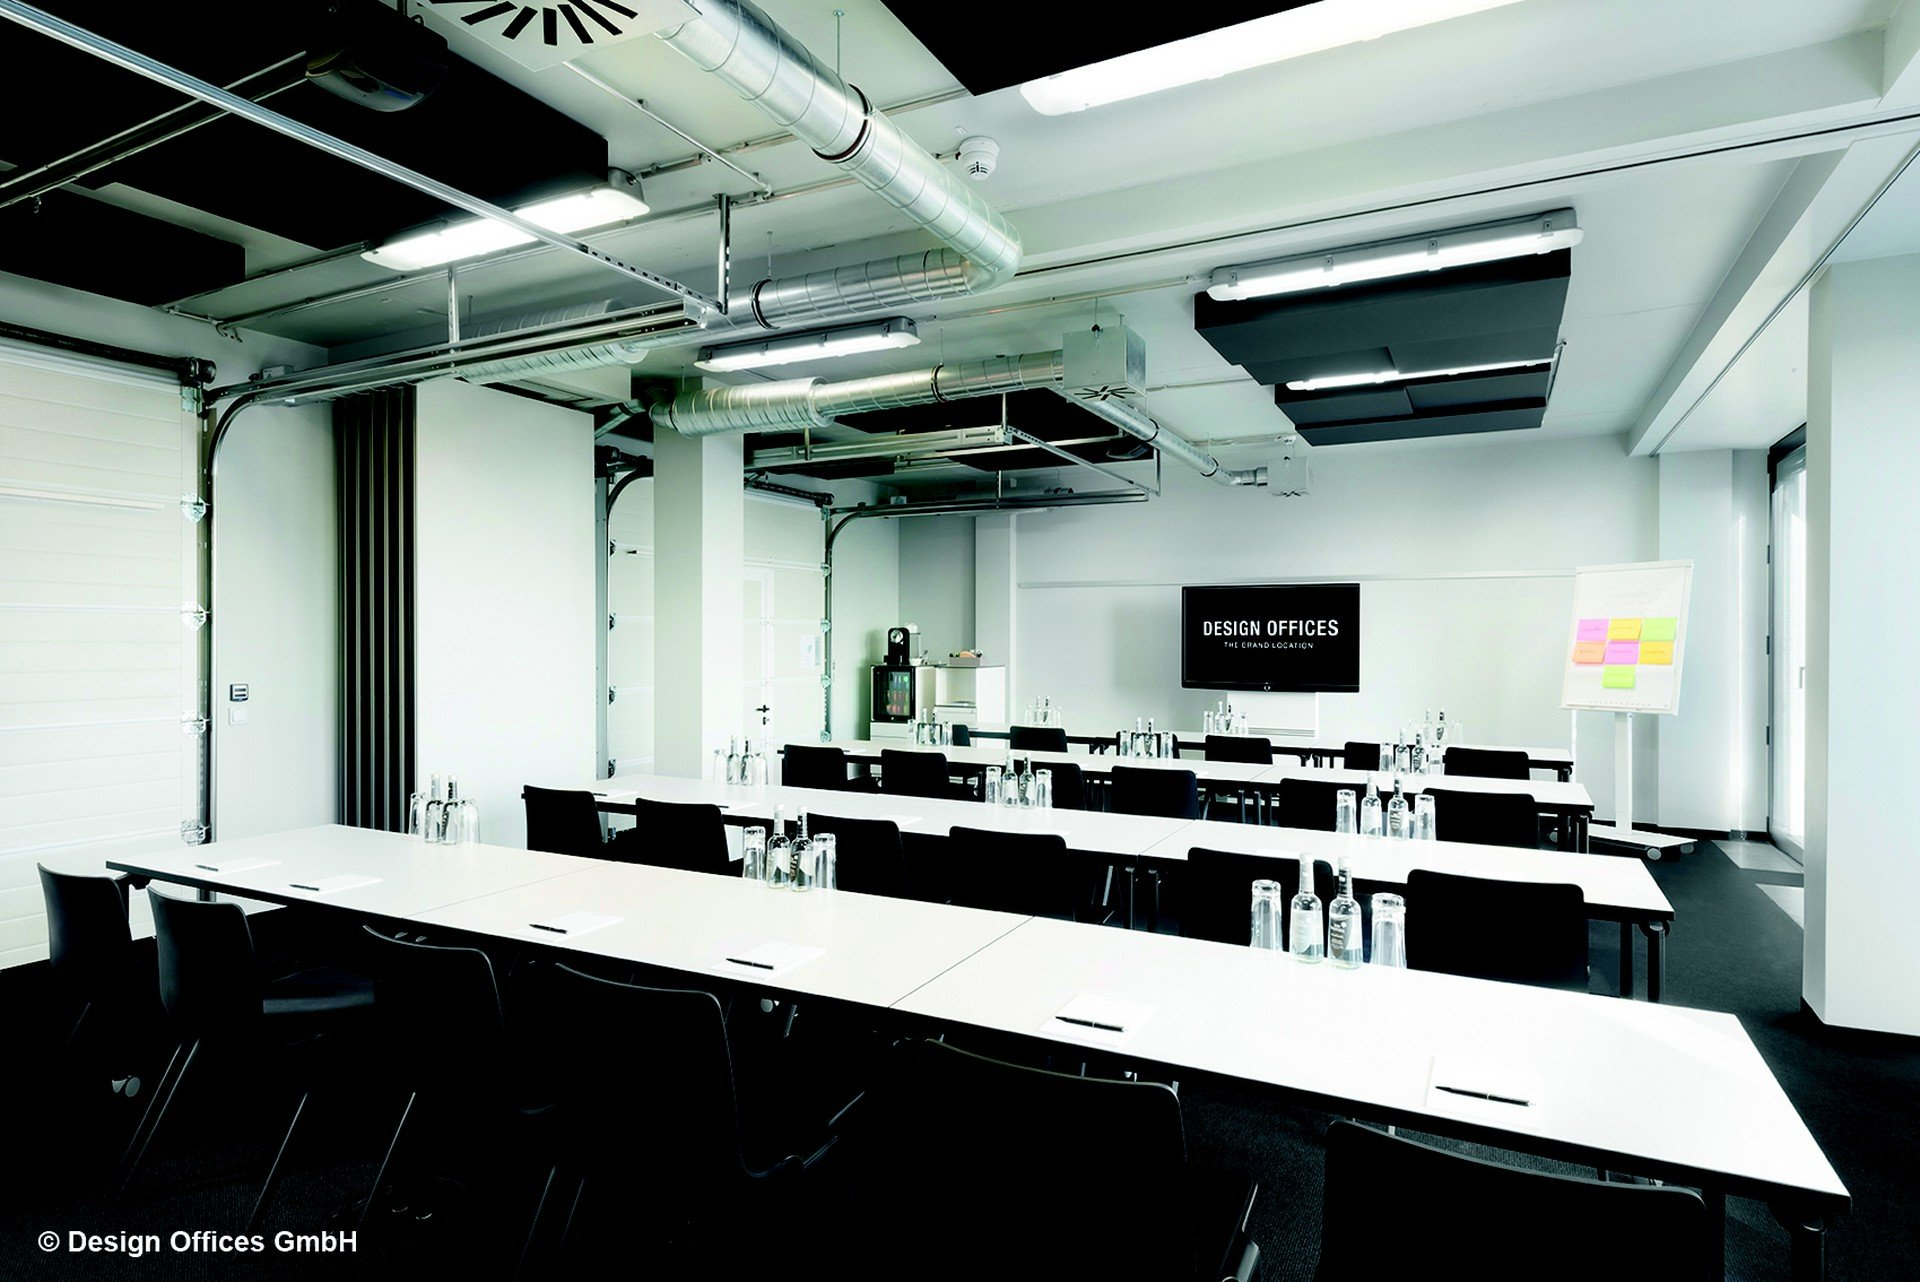 Hamburg conference rooms Salle de réunion Design Offices Hamburg Domplatz - Project Room  3 & 4 image 0